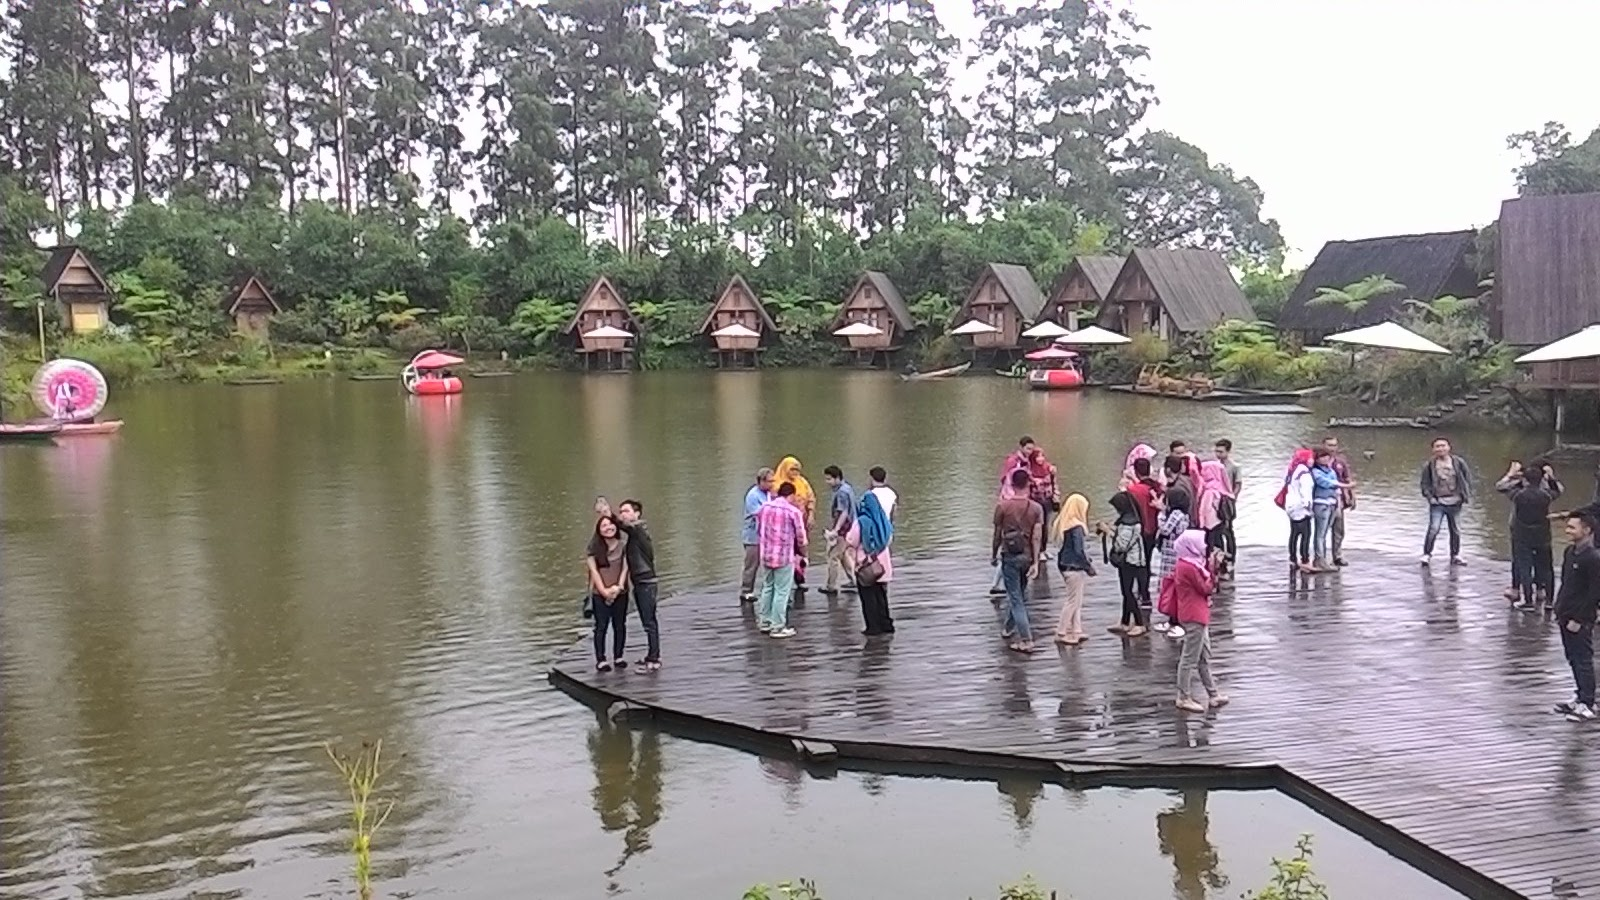 dusun bambu merupakan salah satu destinasi yang lagi hits di bandung tepatnya lembang lokasi perbukitan dan banyaknya pepohonan rindang seperti